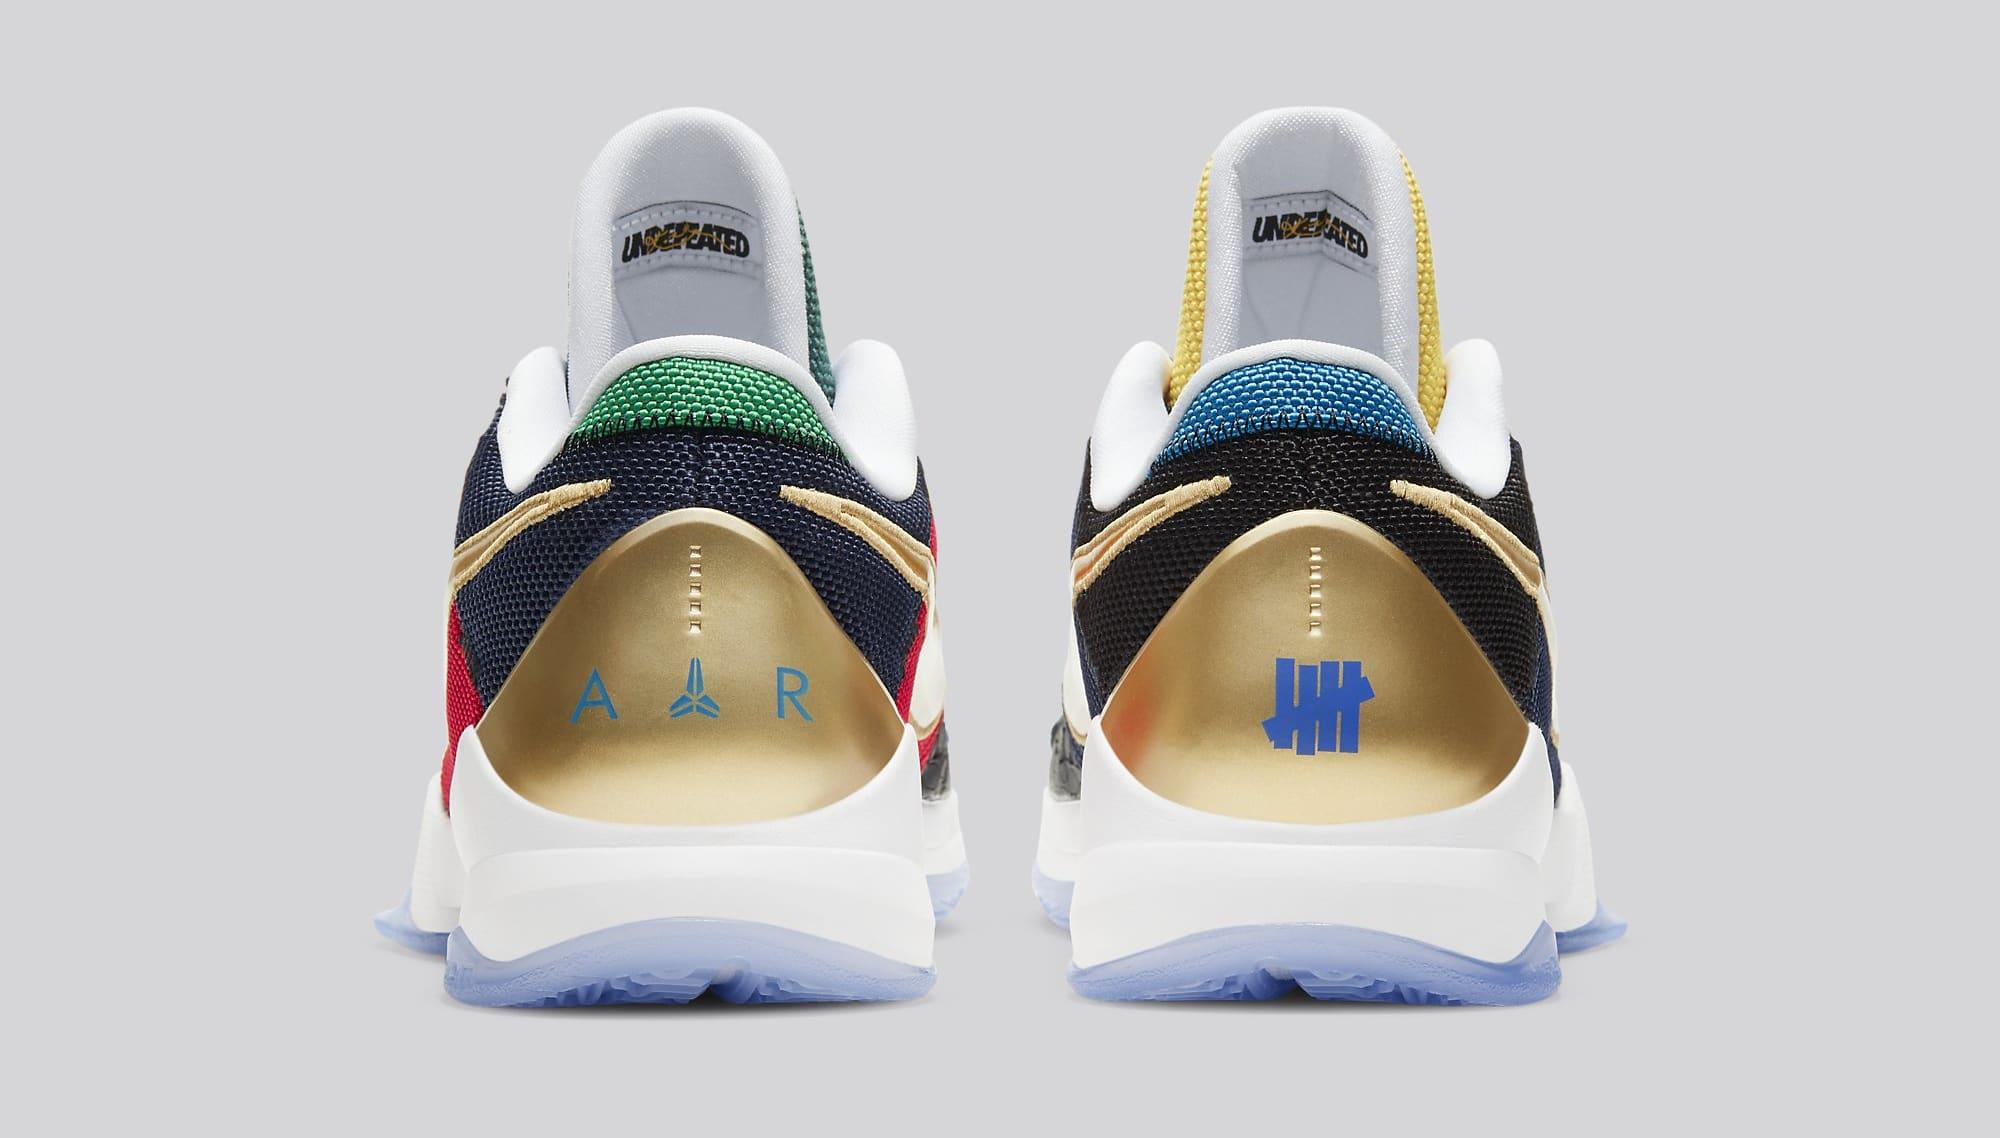 Undefeated x Nike Kobe 5 Protro 'Dirty Dozen' DB5551-900 Heel